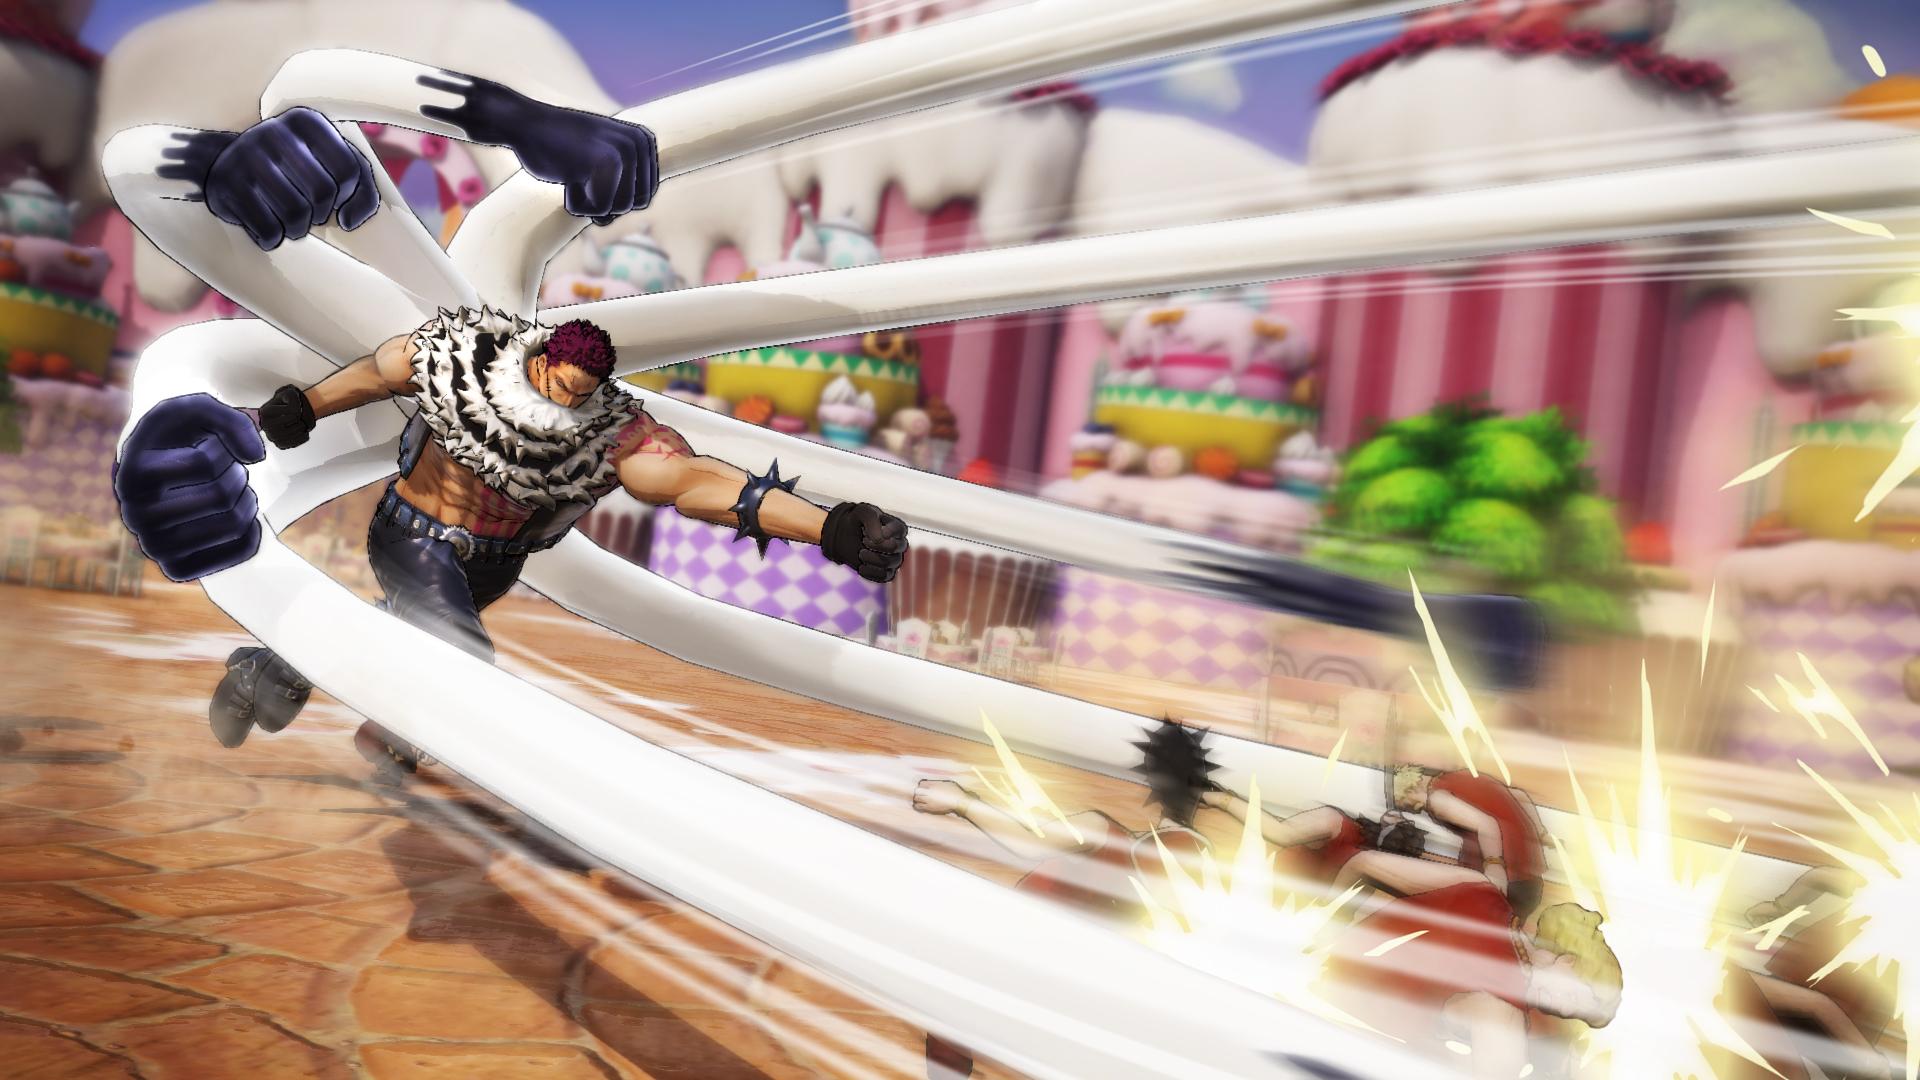 One Piece: Pirate Warriors 4